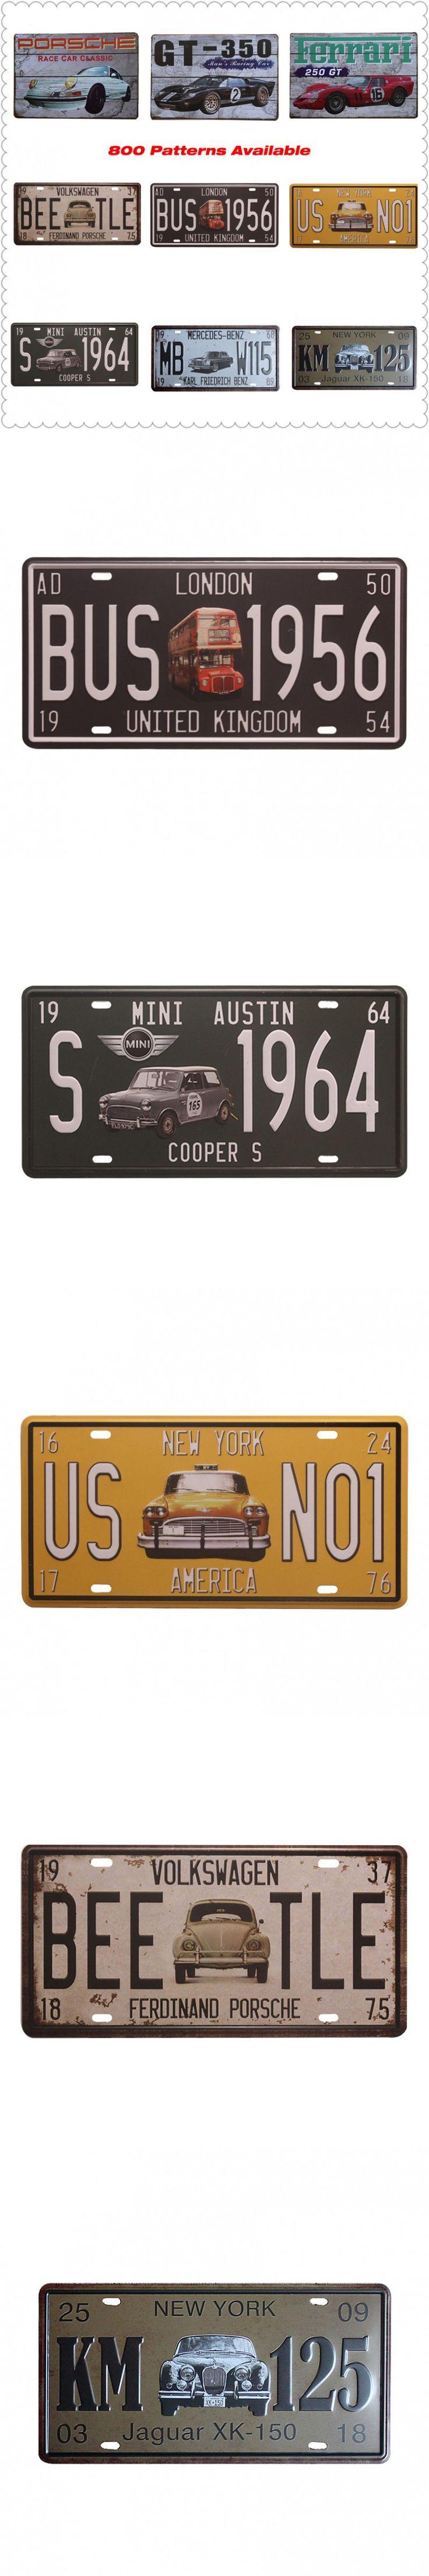 Shbby Chic Car Plate Vintage Metal Signs Home Decor Vintage Tin Signs Pub Vintage Decorative Plates Metal Wall Art $4.96